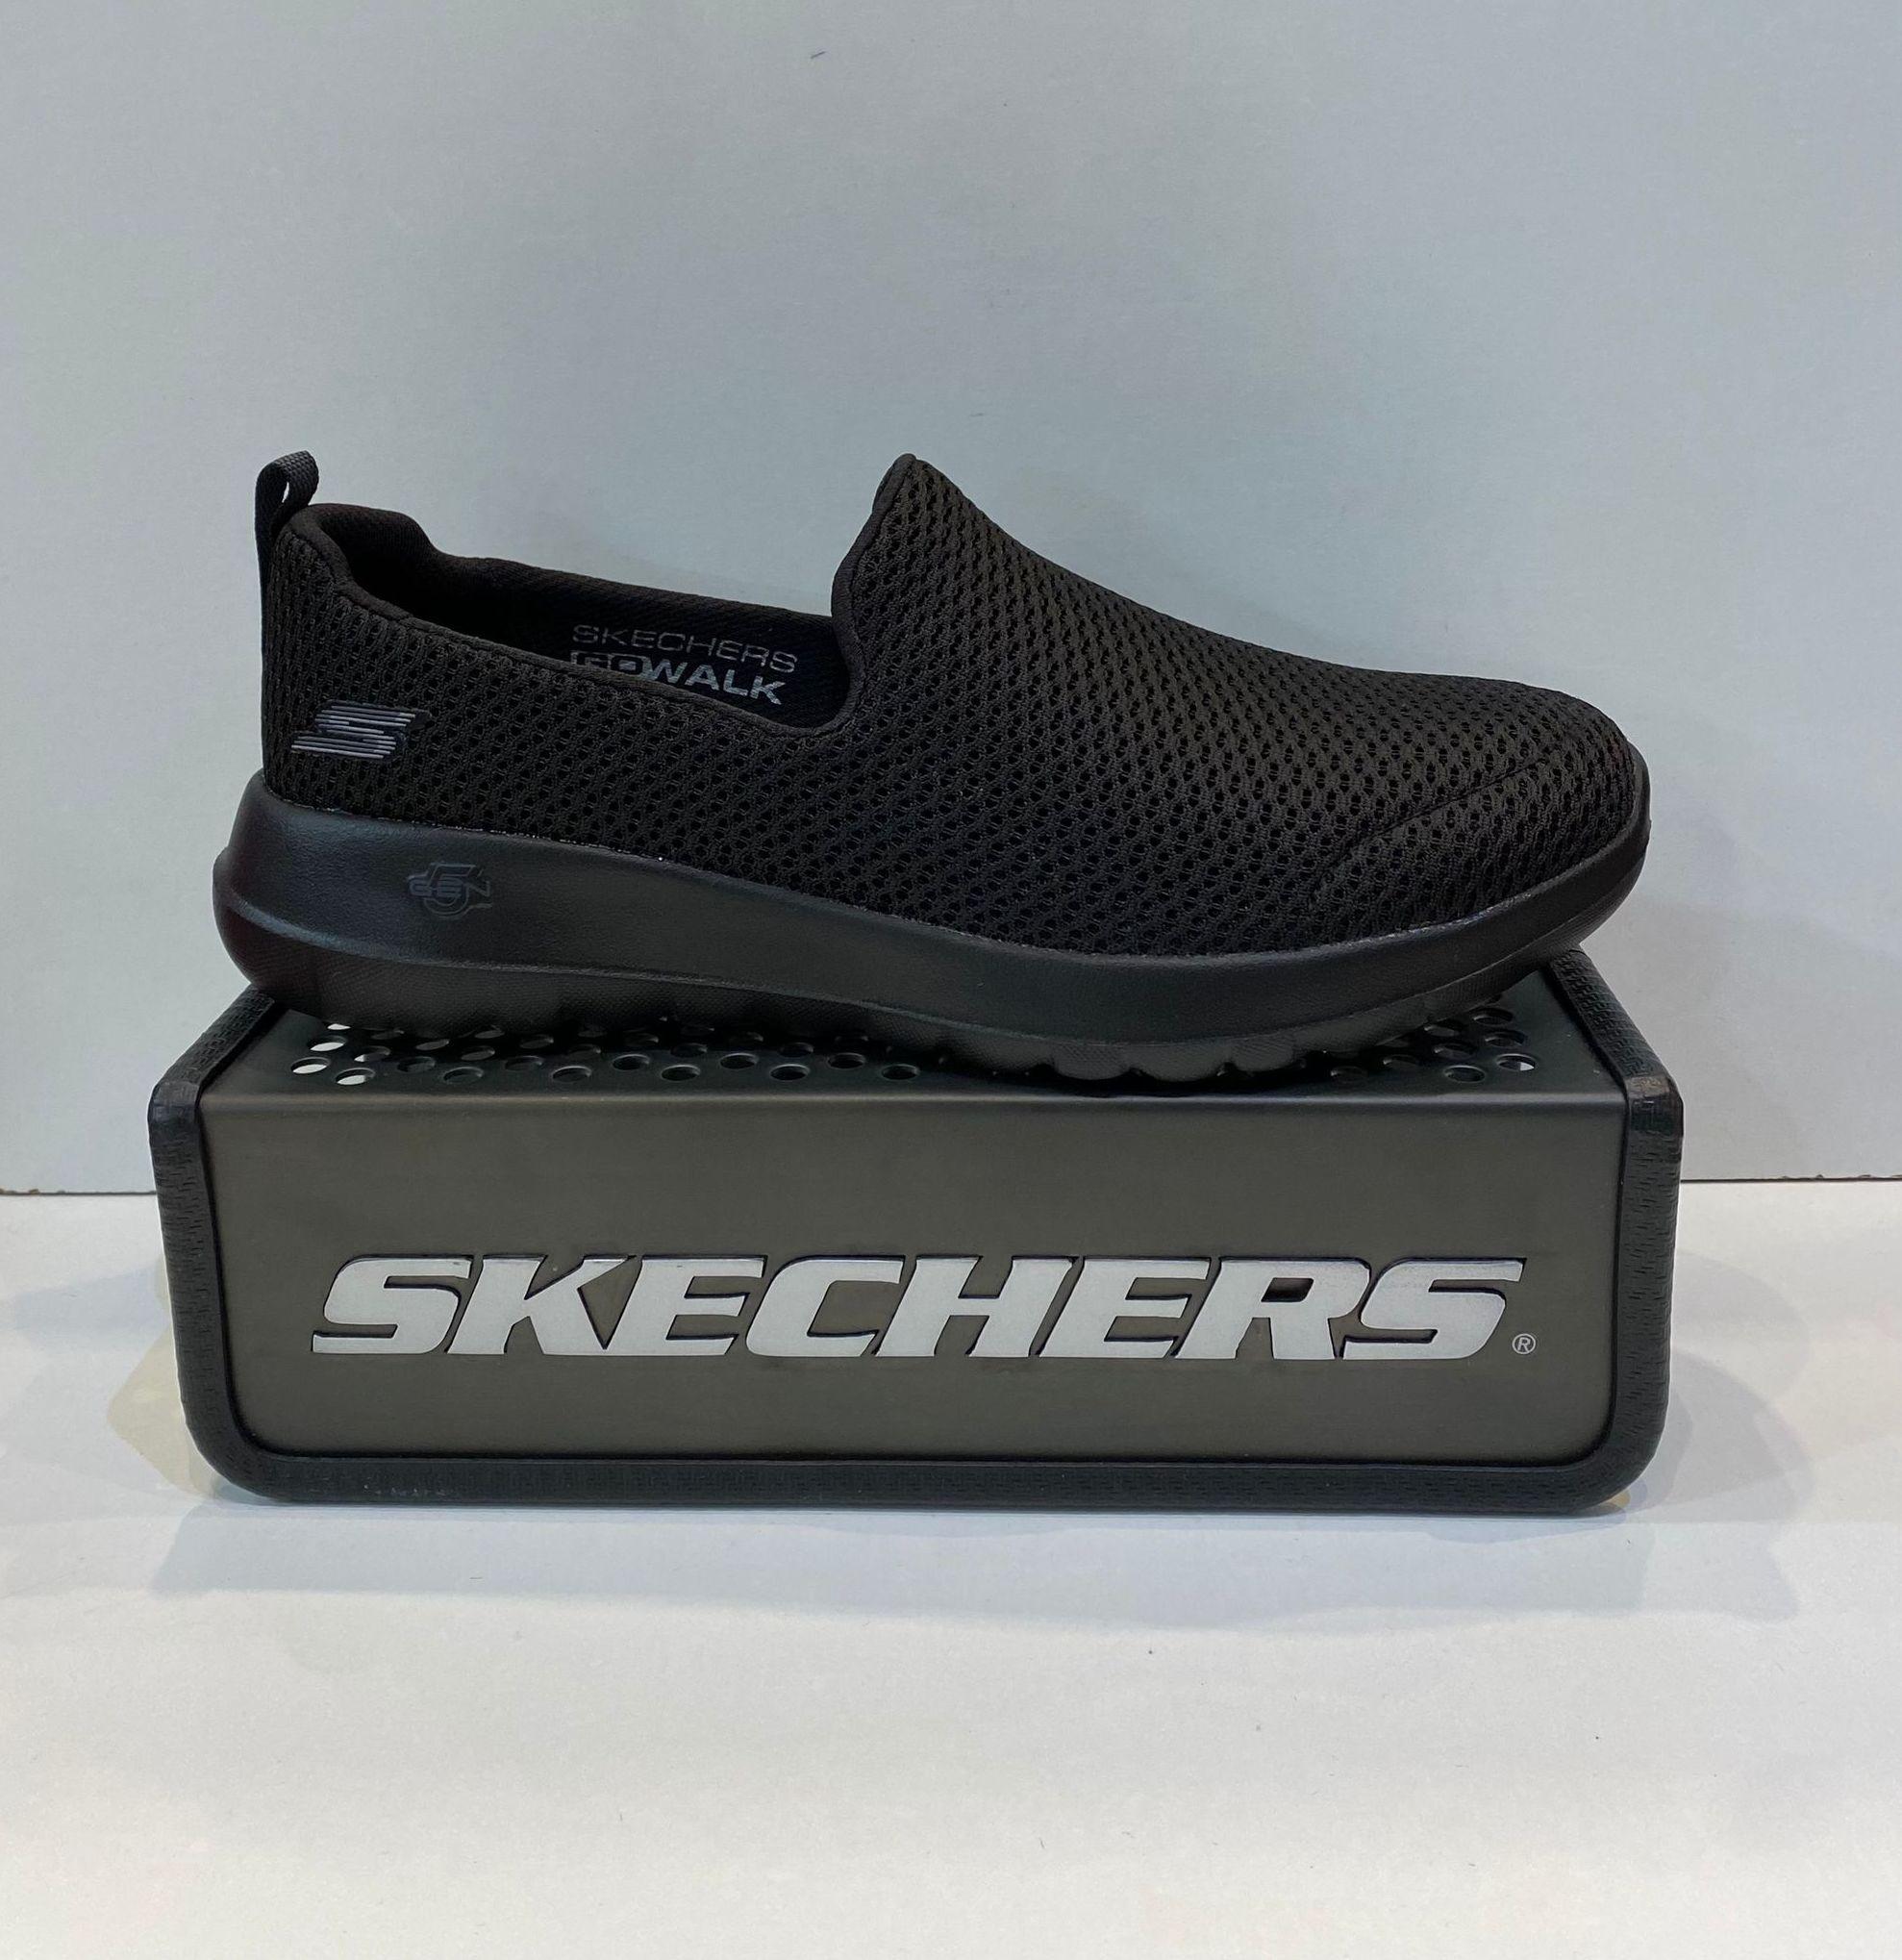 Sabata esportiva de dona, de la marca Skechers Go Walk, ample especial, plantilla extraible Goga Max, adaptable a plantilles ortopèdiques, sola de resalite 5 Gen 59.95€ www.calzadosllinas.es